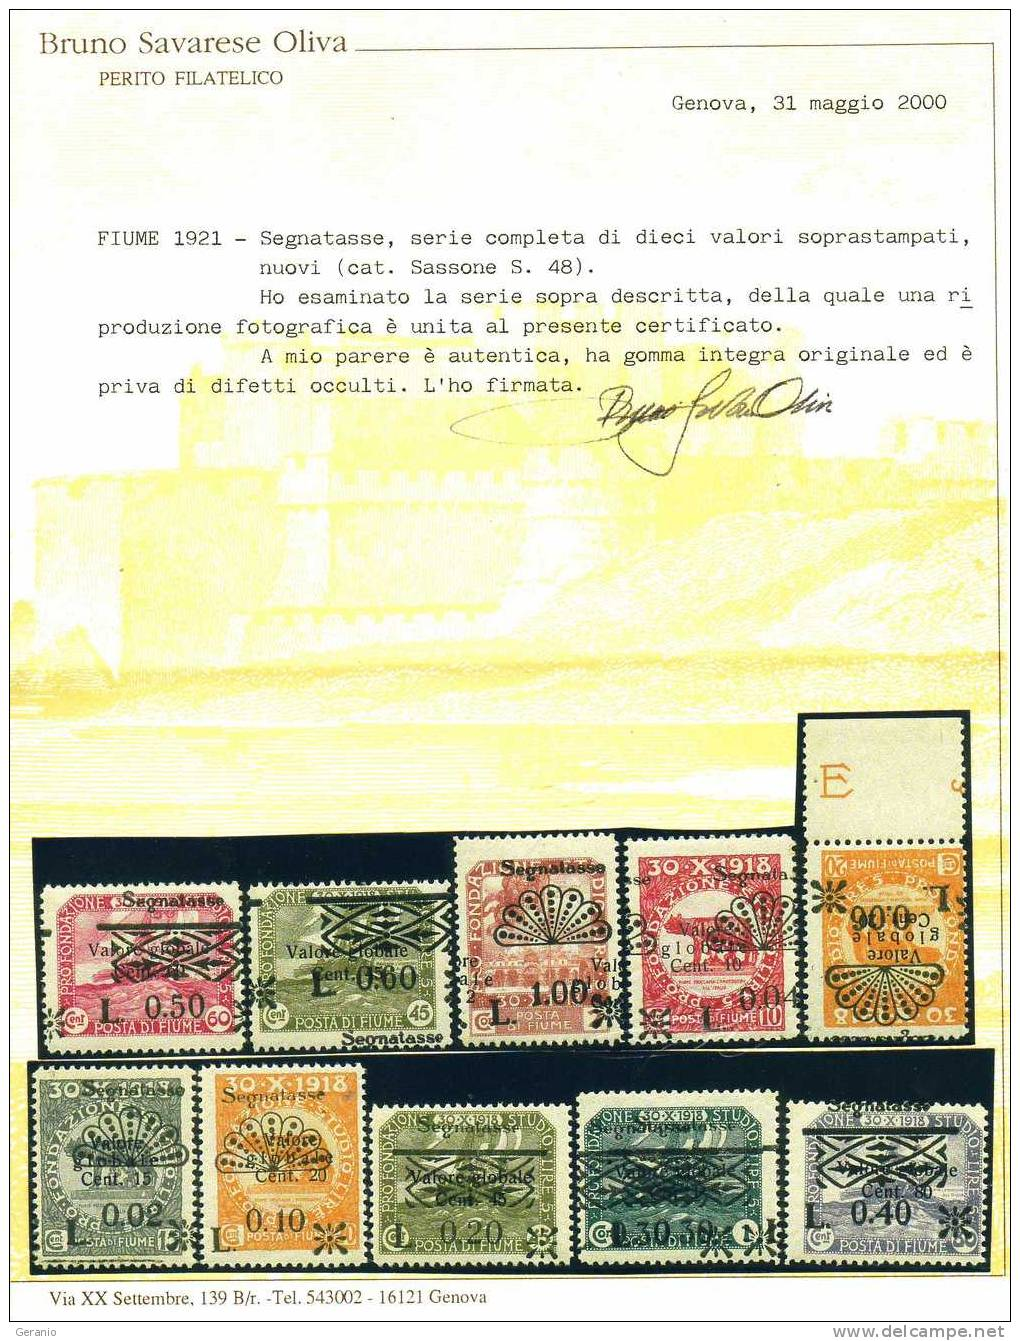 SEGNATASSE 1921 SERIE COMPLETA CERTIFICATA  VALORE SASSONE2011  11.000 EURO - Fiume